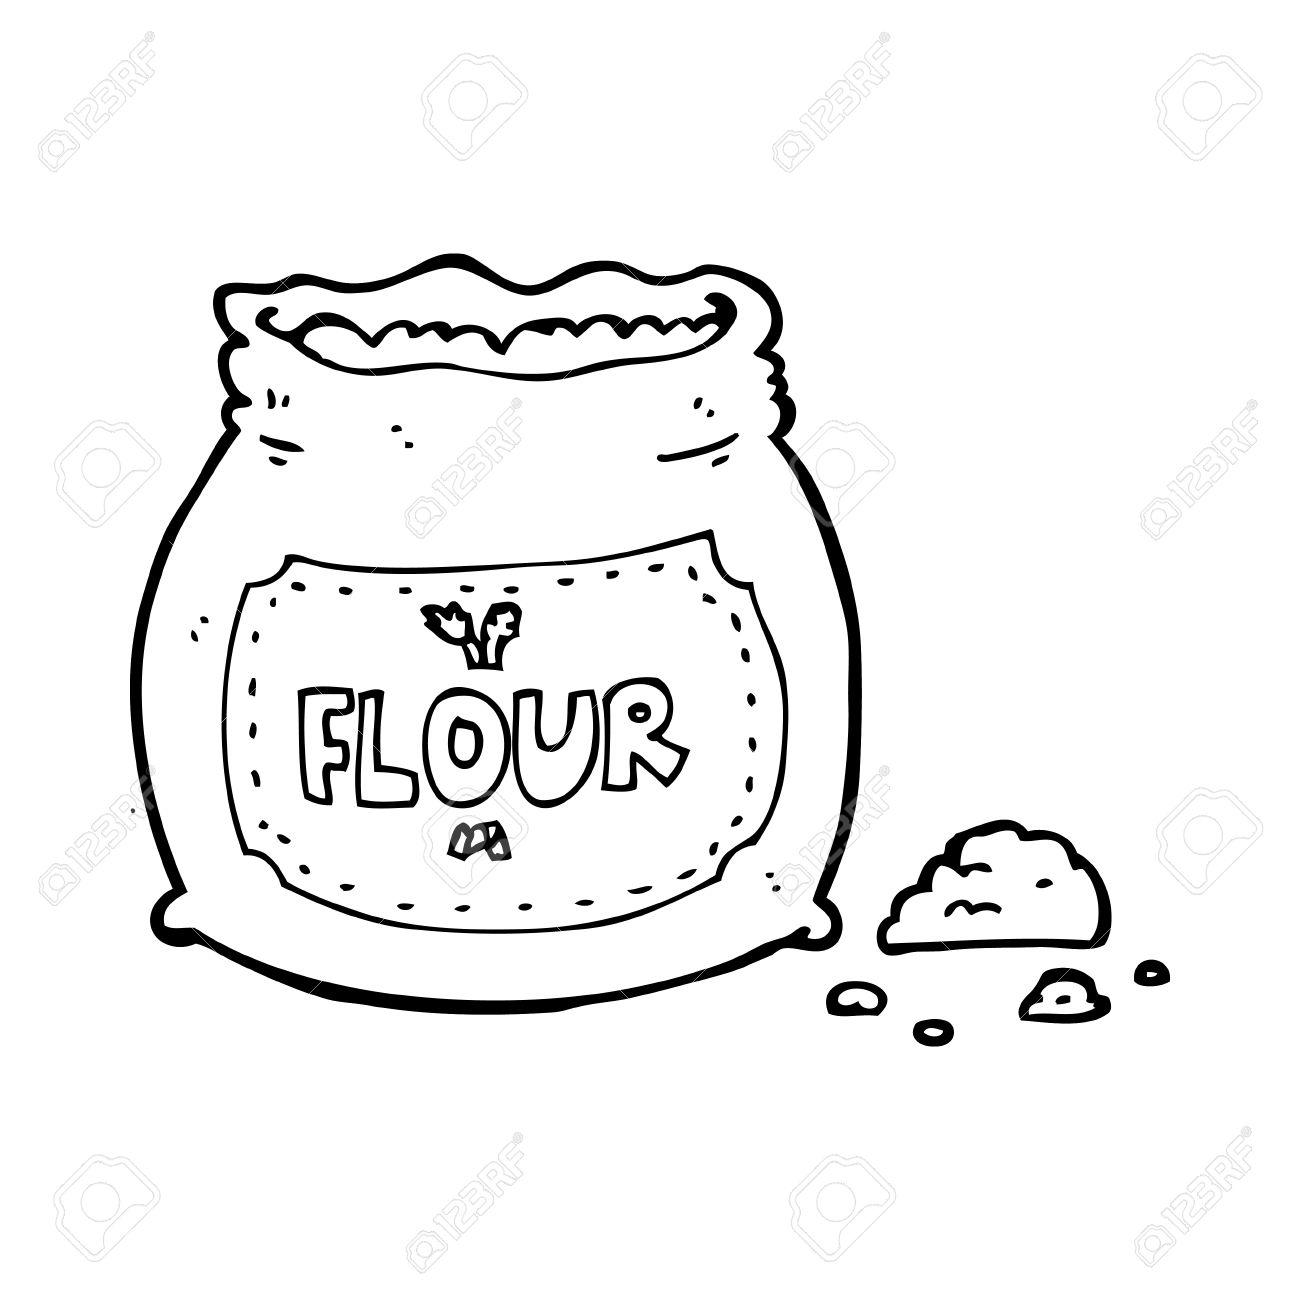 Flour clipart bag flour #6